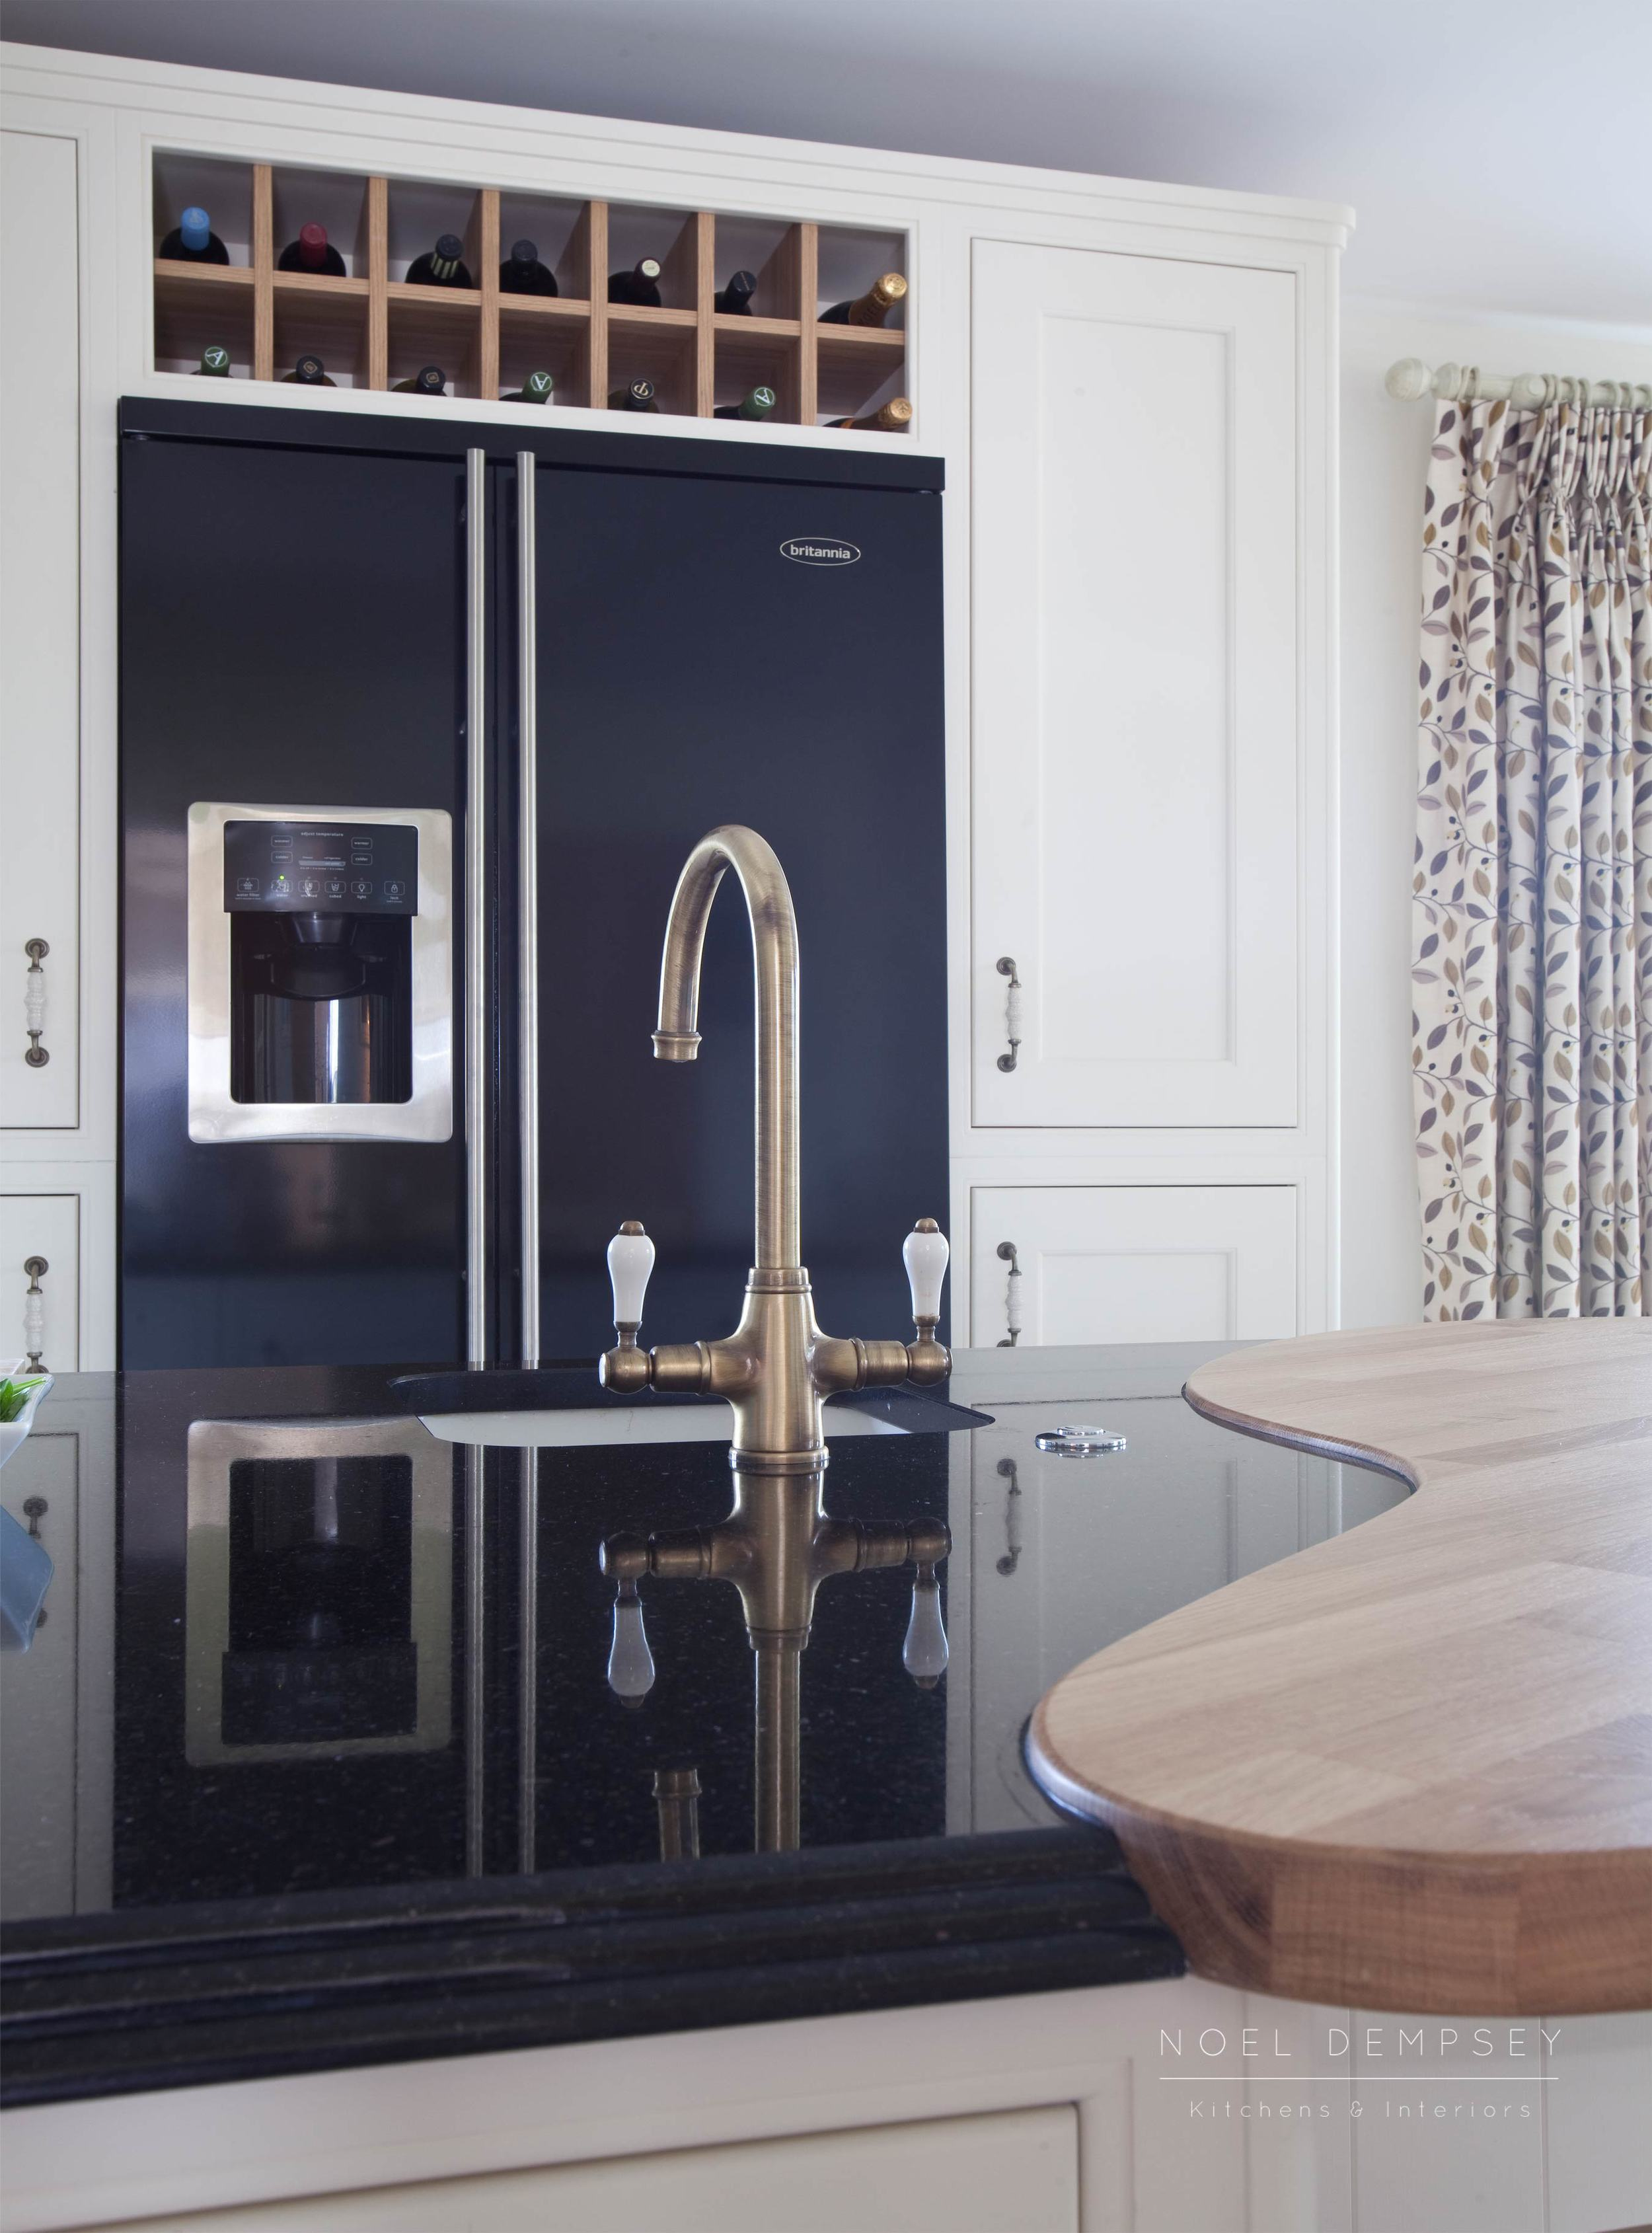 Fox-lane-inframe-hand-painted-kitchens-4.jpg